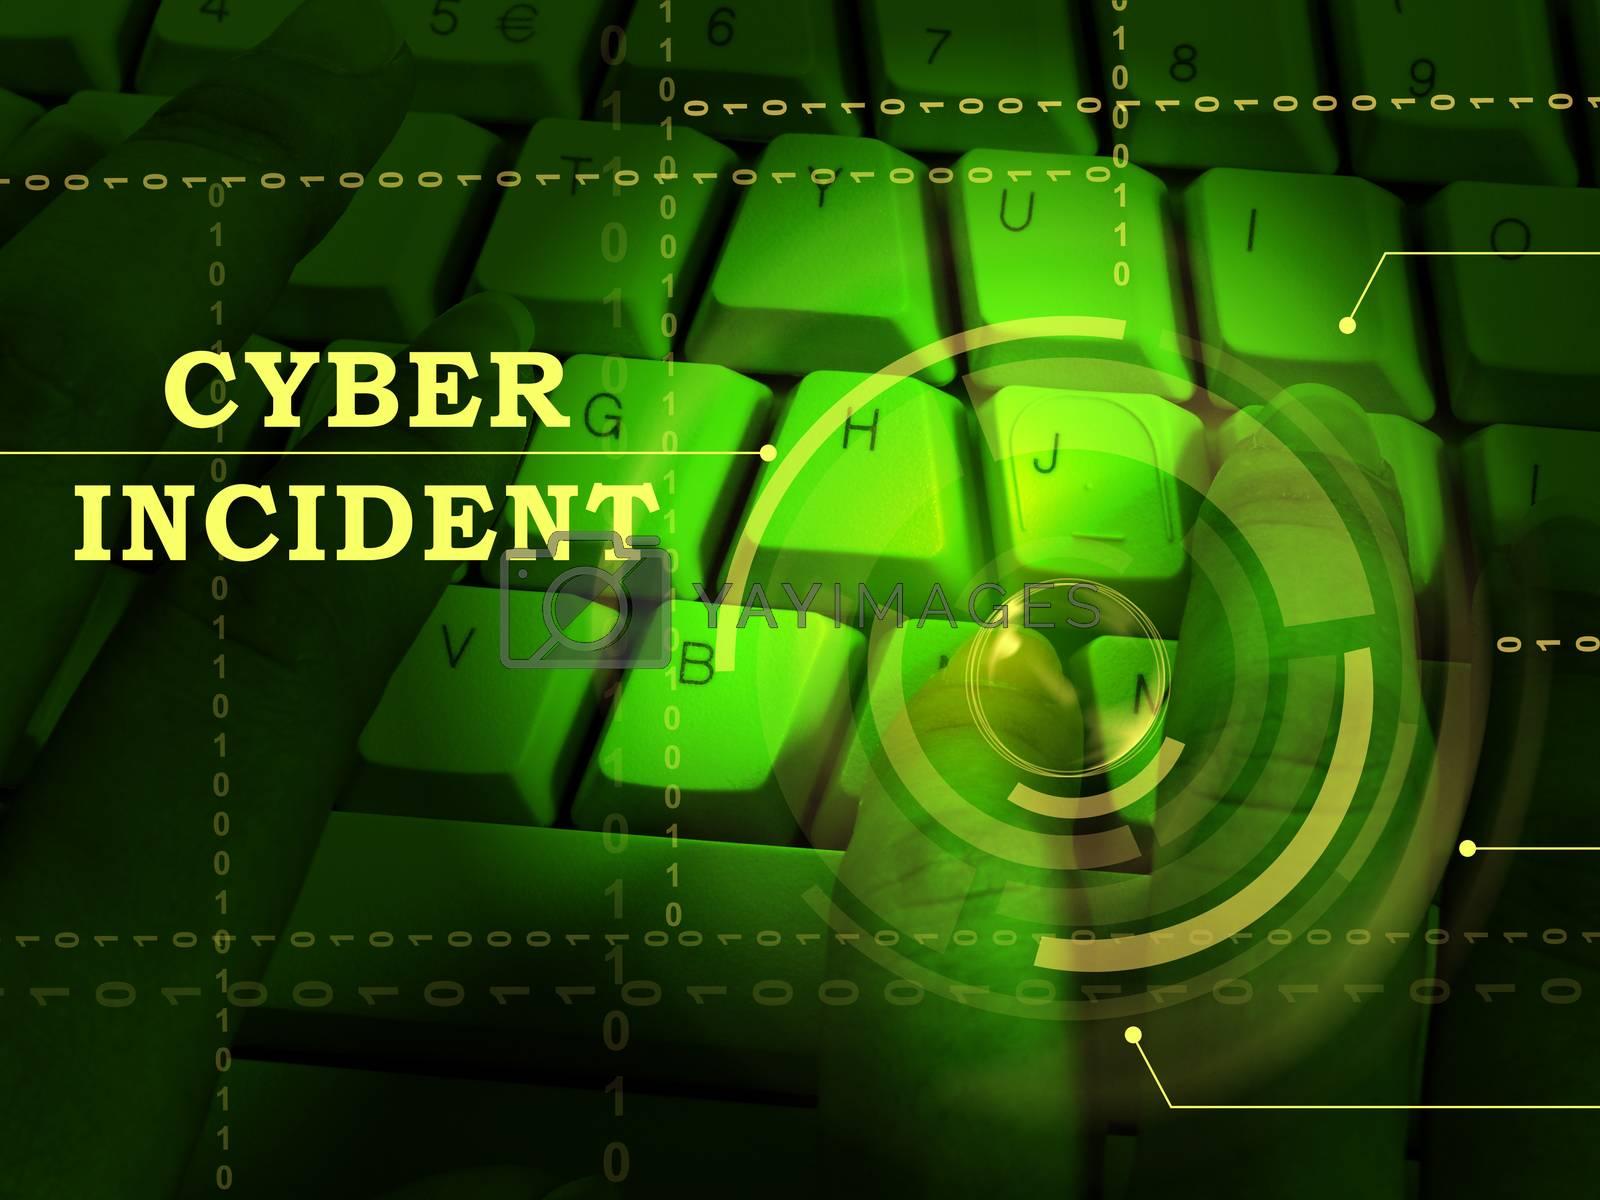 Cyber Incident Data Attack Alert 3d Illustration by stuartmiles